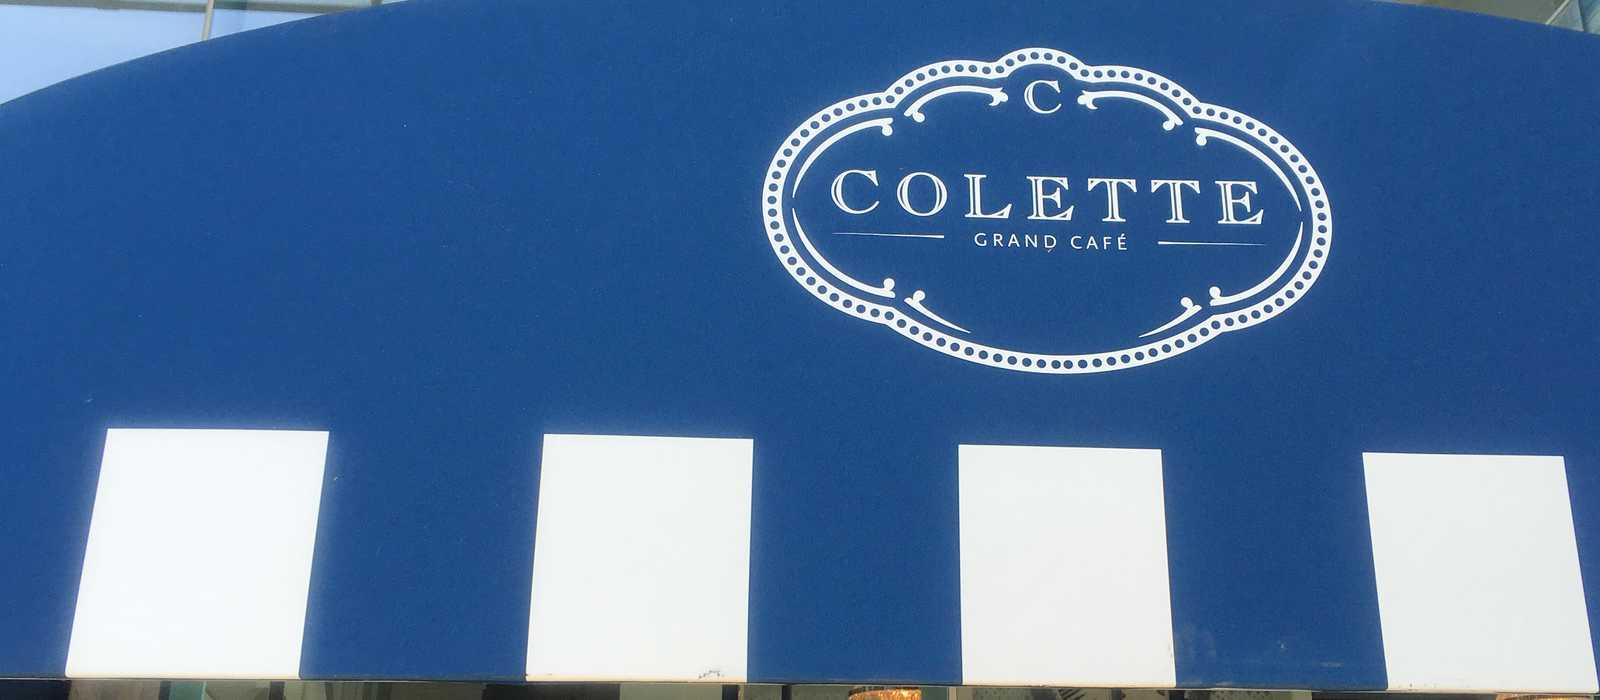 Eingang zum Colette Grand Café